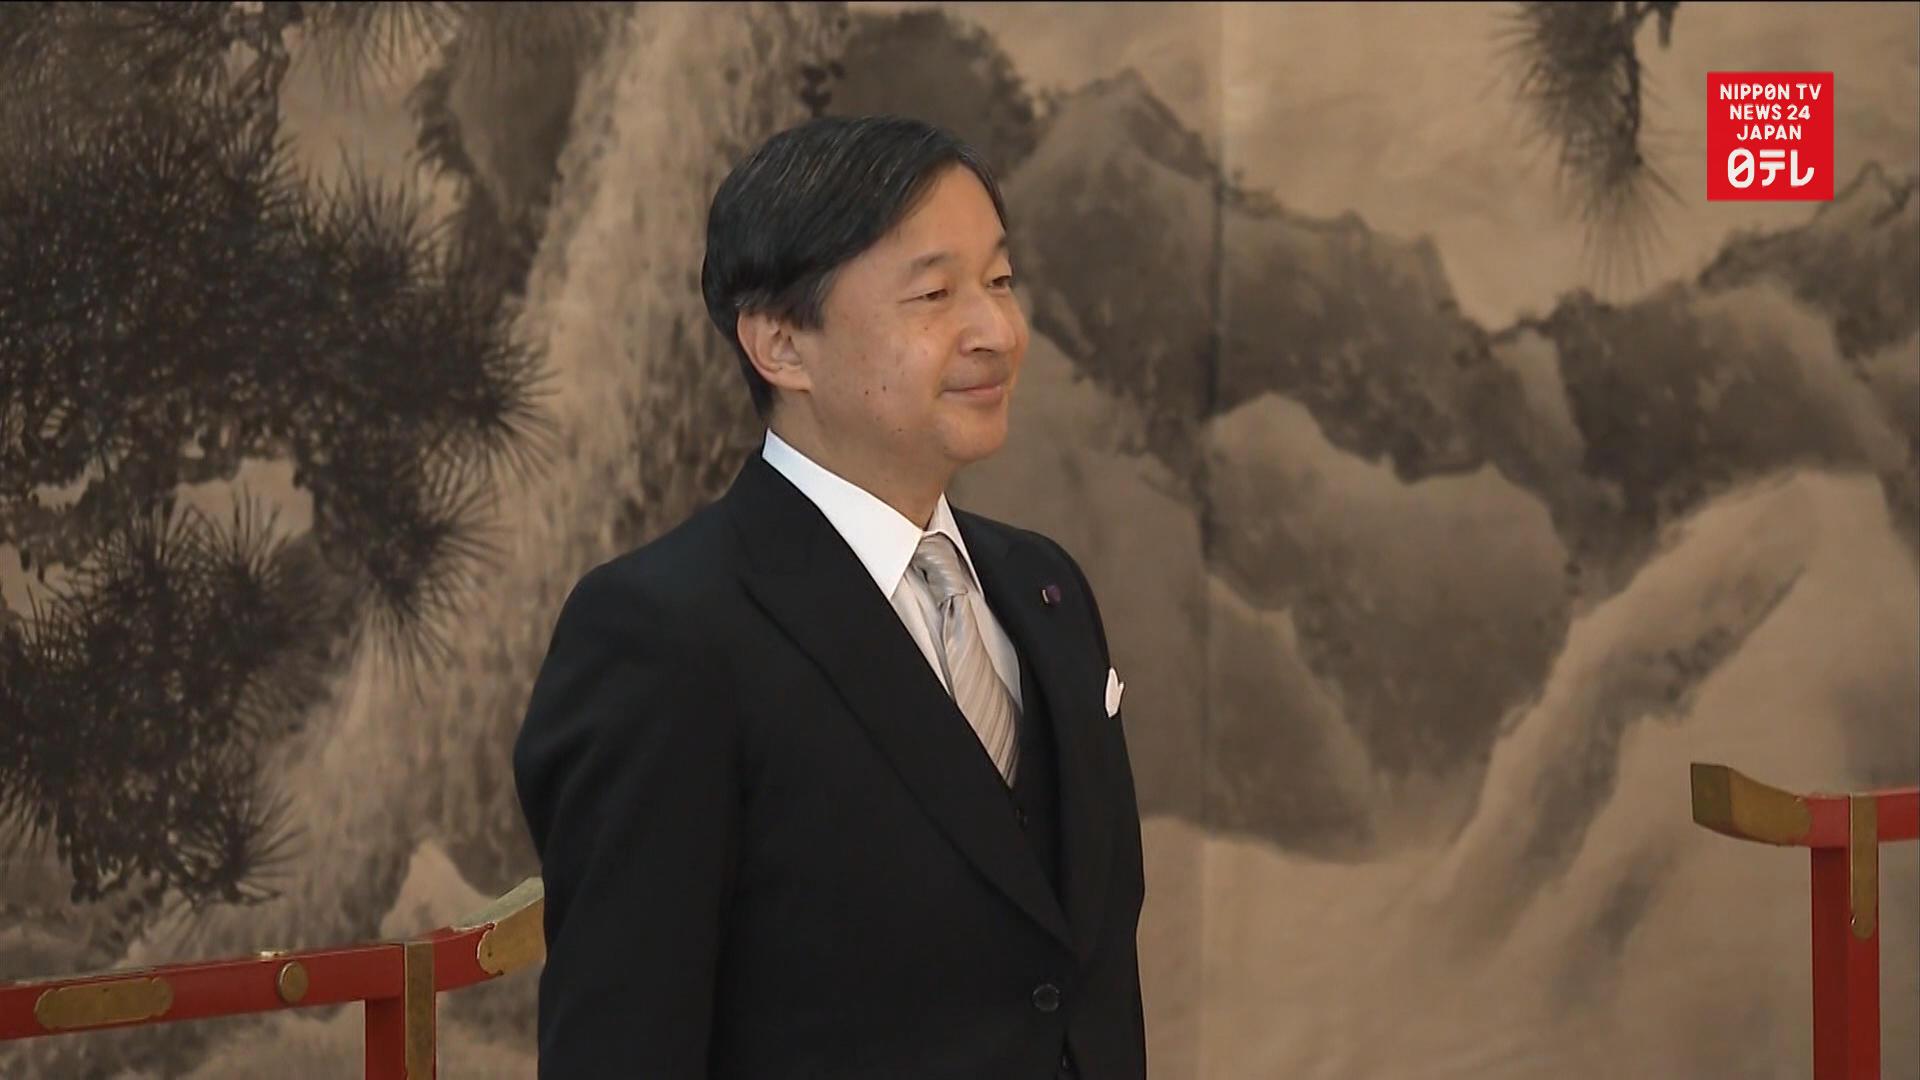 Emperor attends Grand Banquet to fete succession